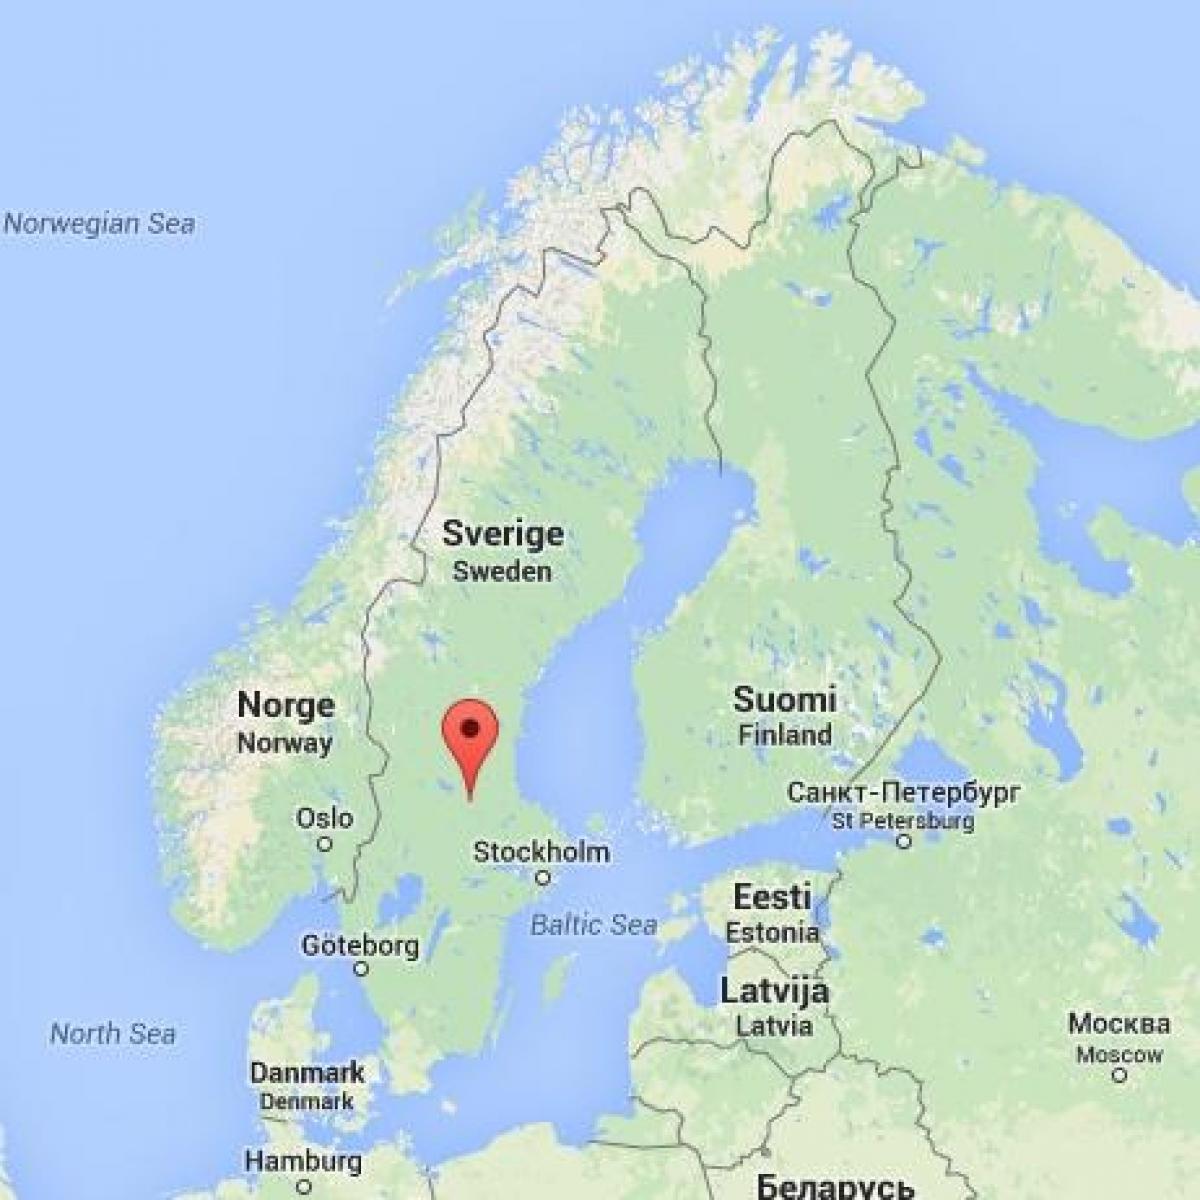 sverige kart falun Falun Sverige kart   Kart over Falun i Sverige (Nord Europa   Europa) sverige kart falun